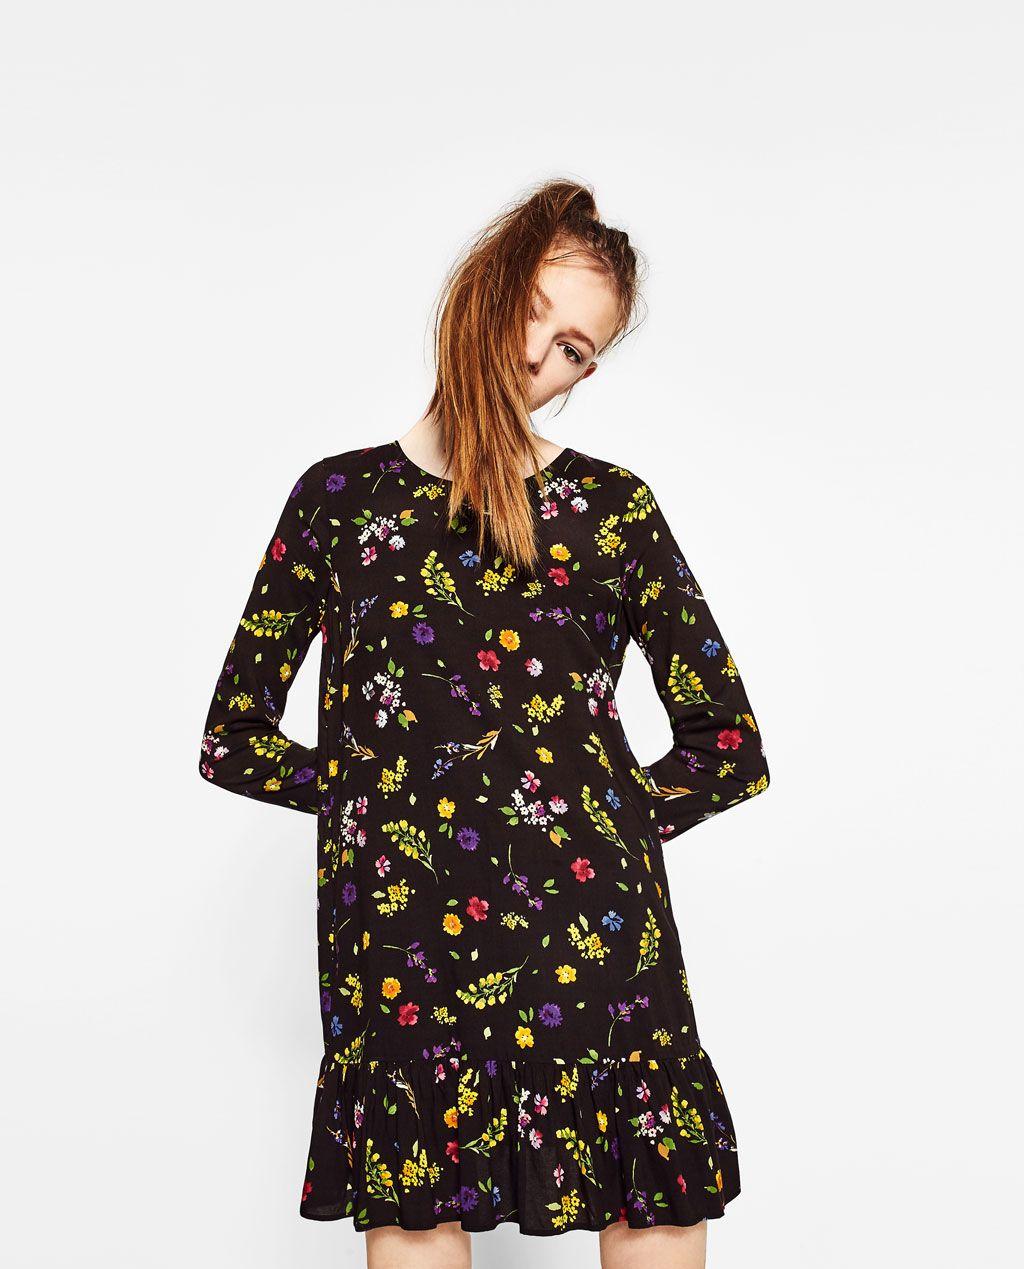 Floral print dress from zara floral print dress